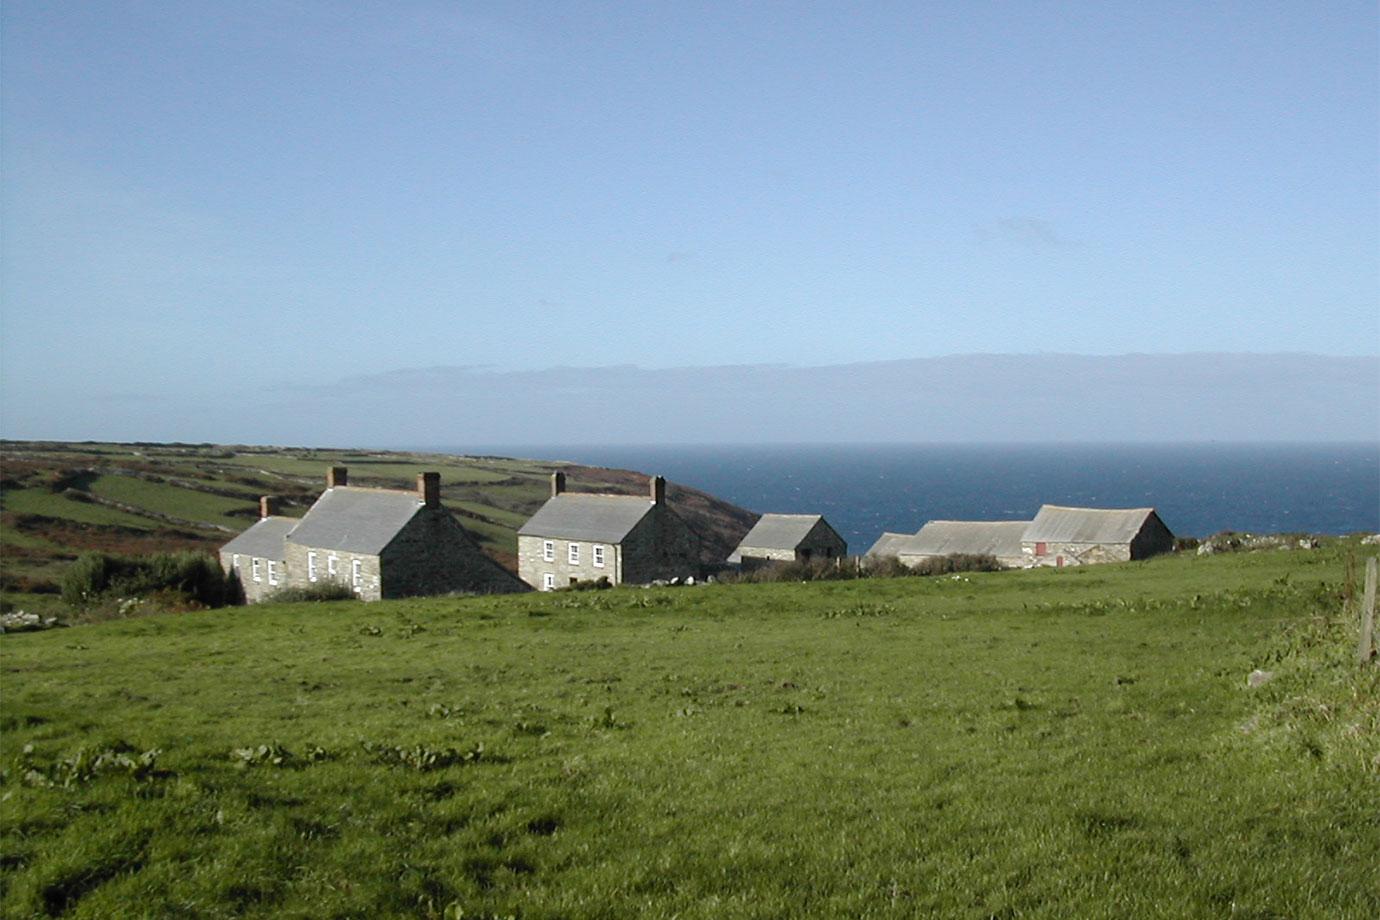 Porthmeor Farm